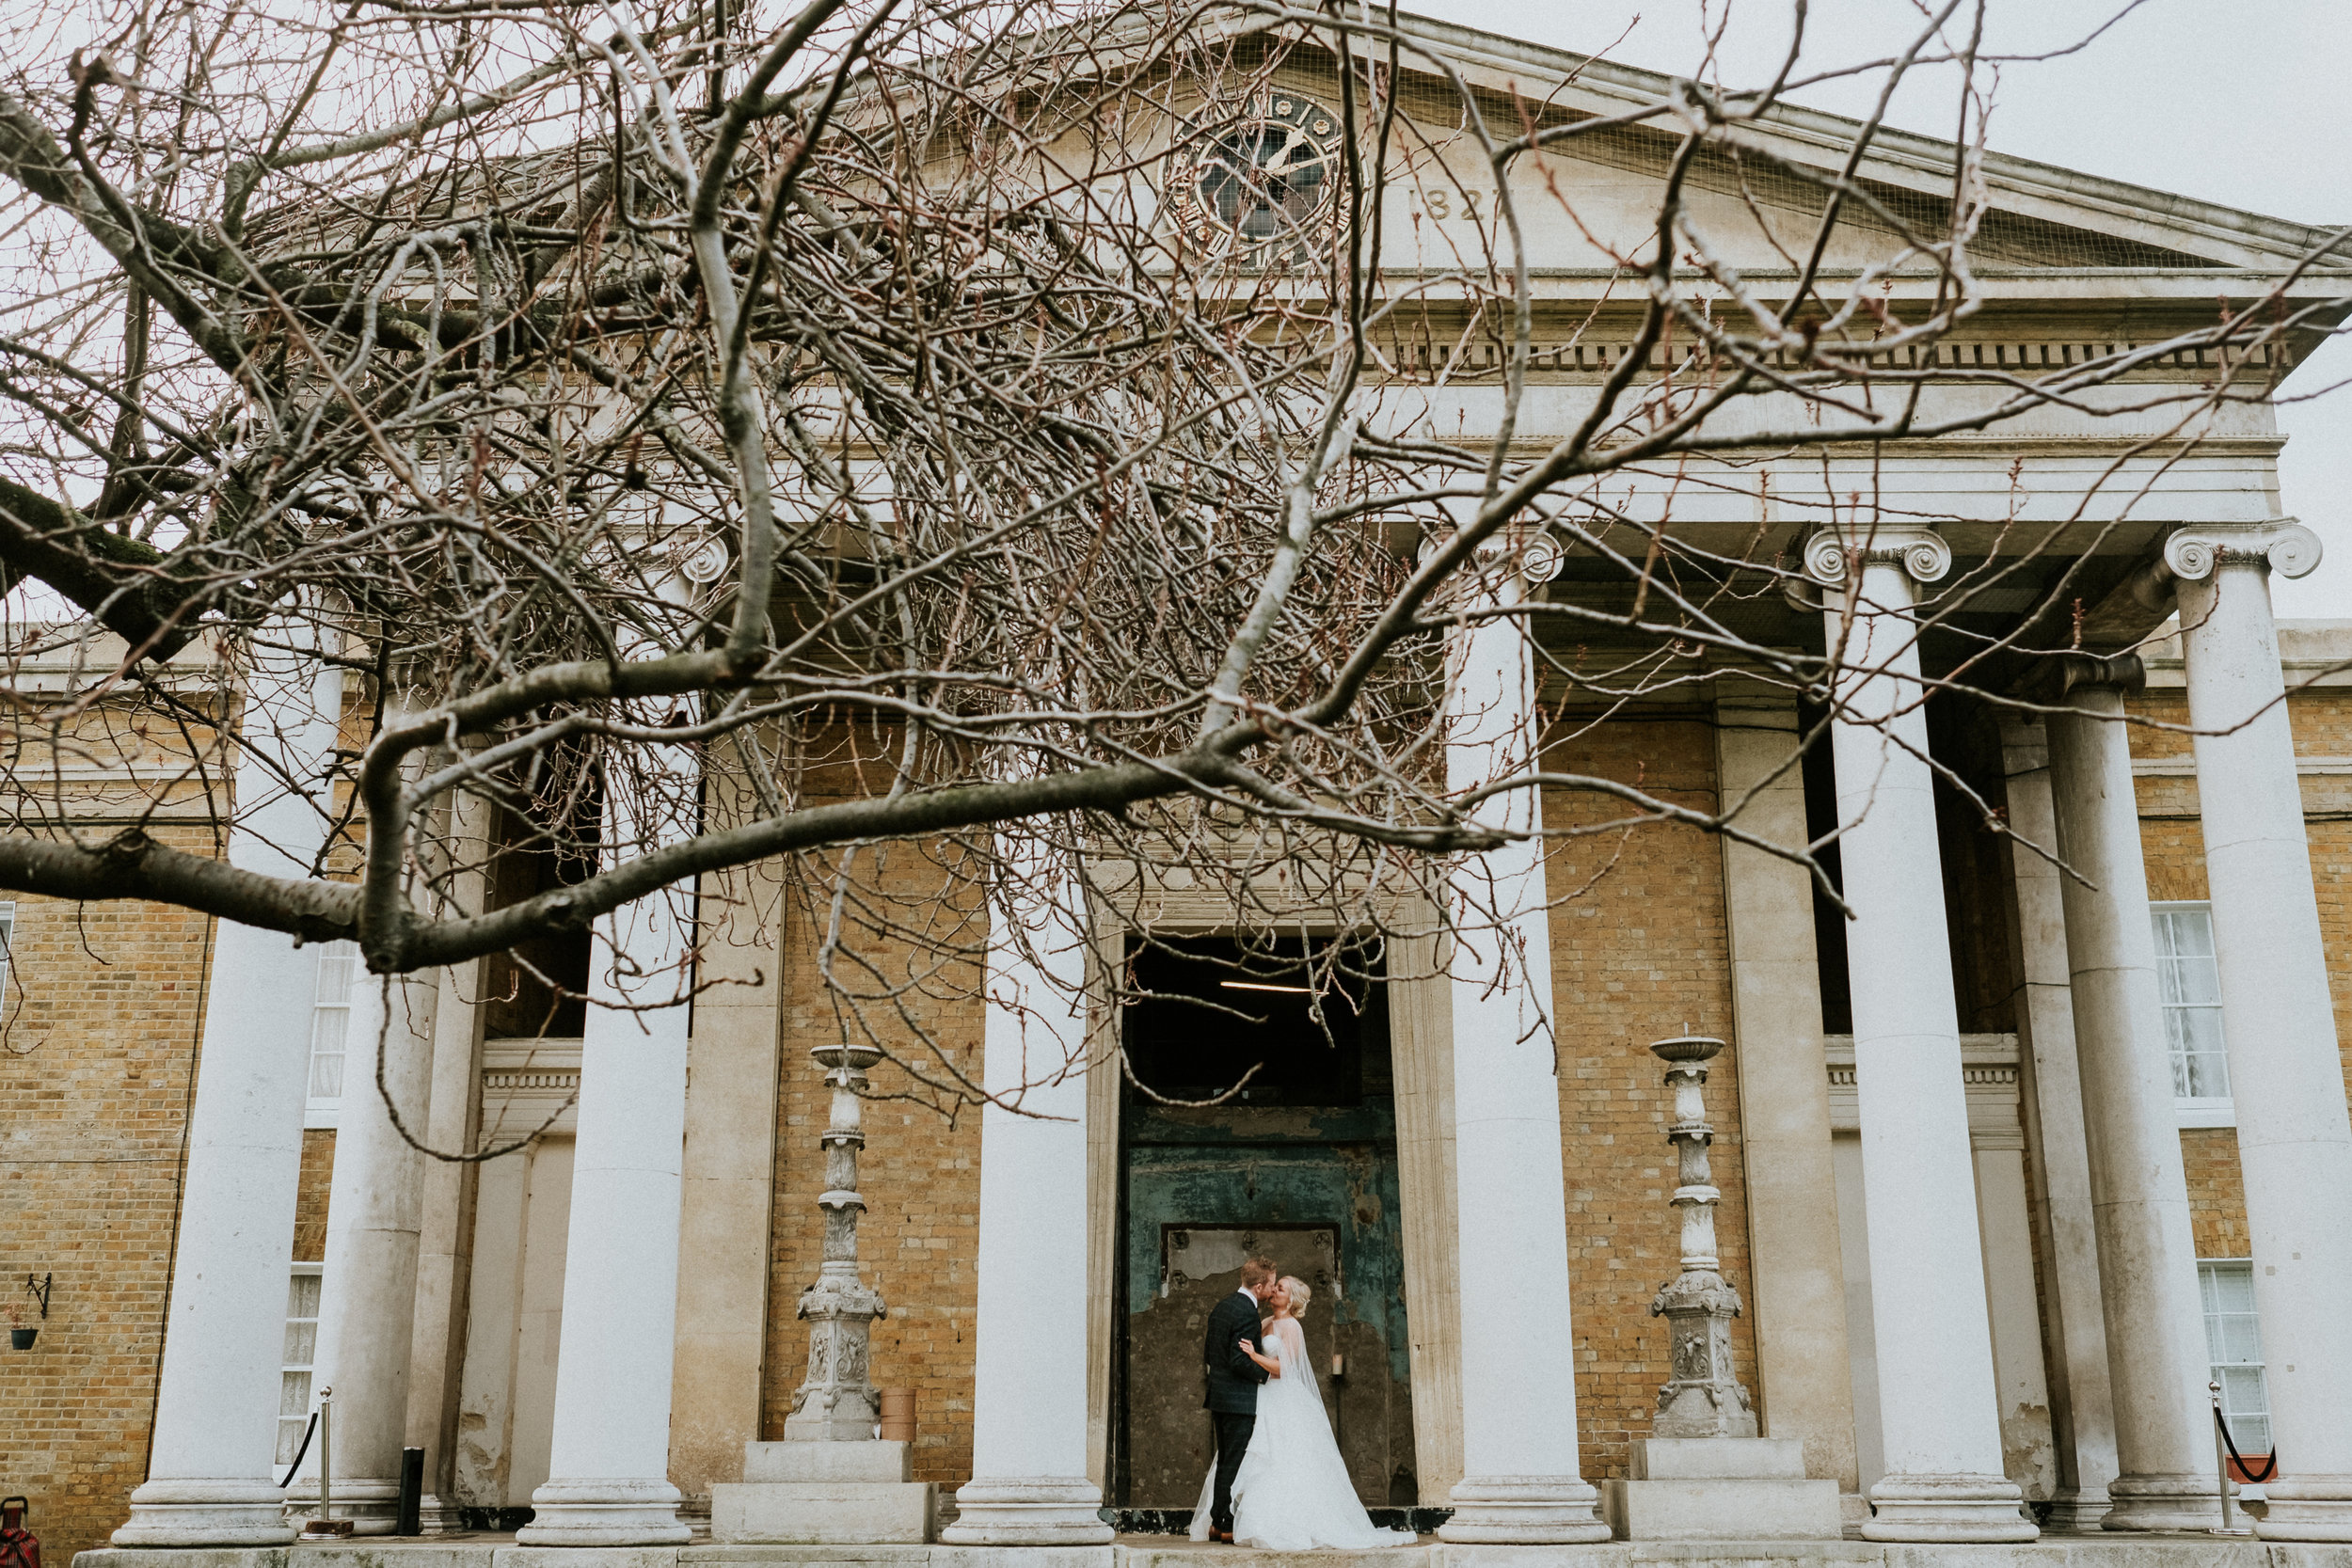 80 London Wedding Winter Christmas Asylum Chapel Photography St Barts Brewery Joanna nicole Photography2.jpg